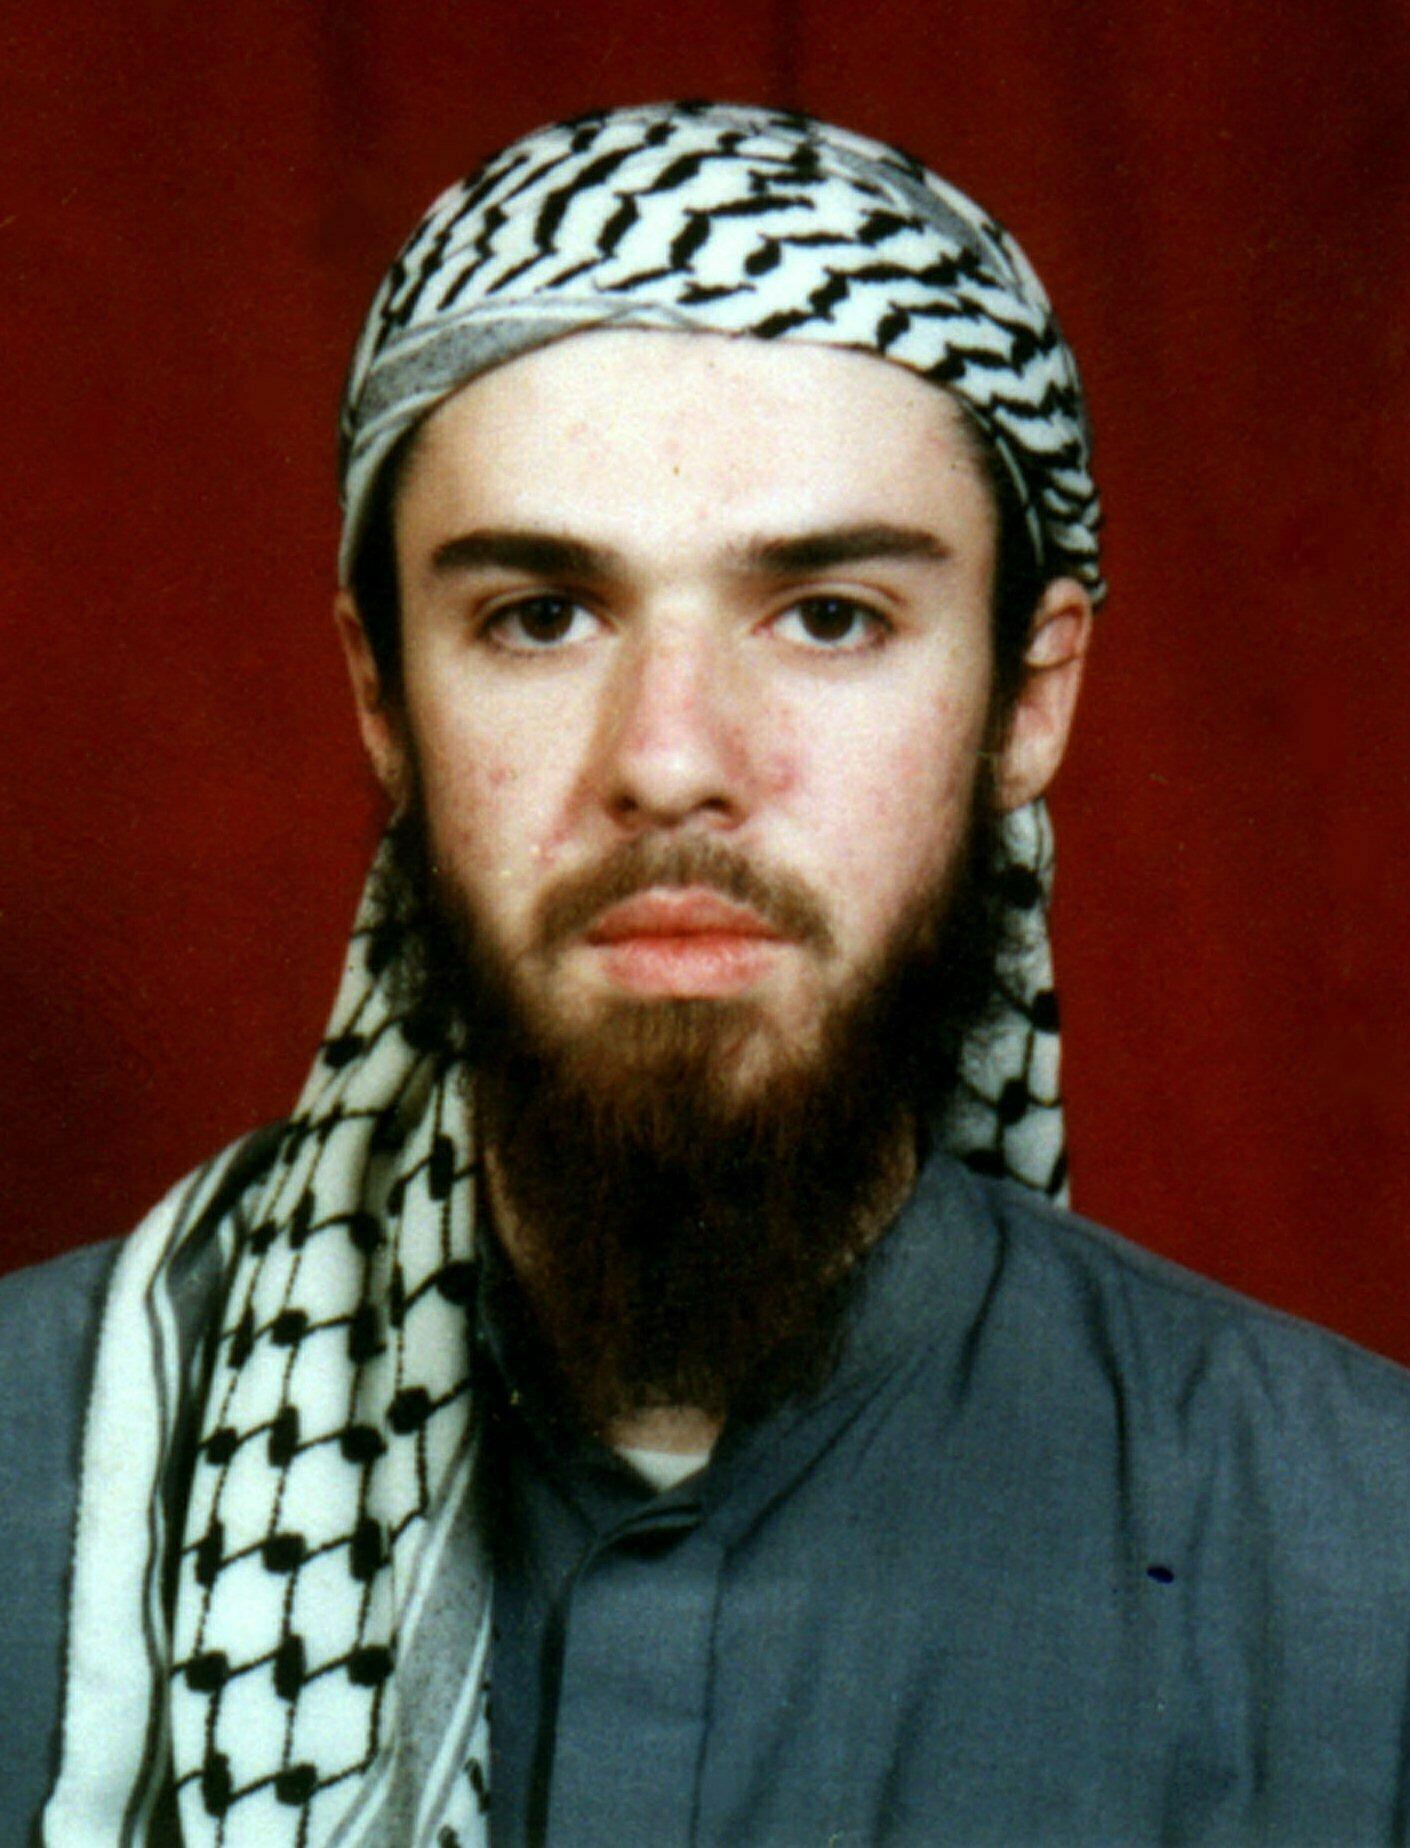 american taliban_1558551233056.jpeg.jpg